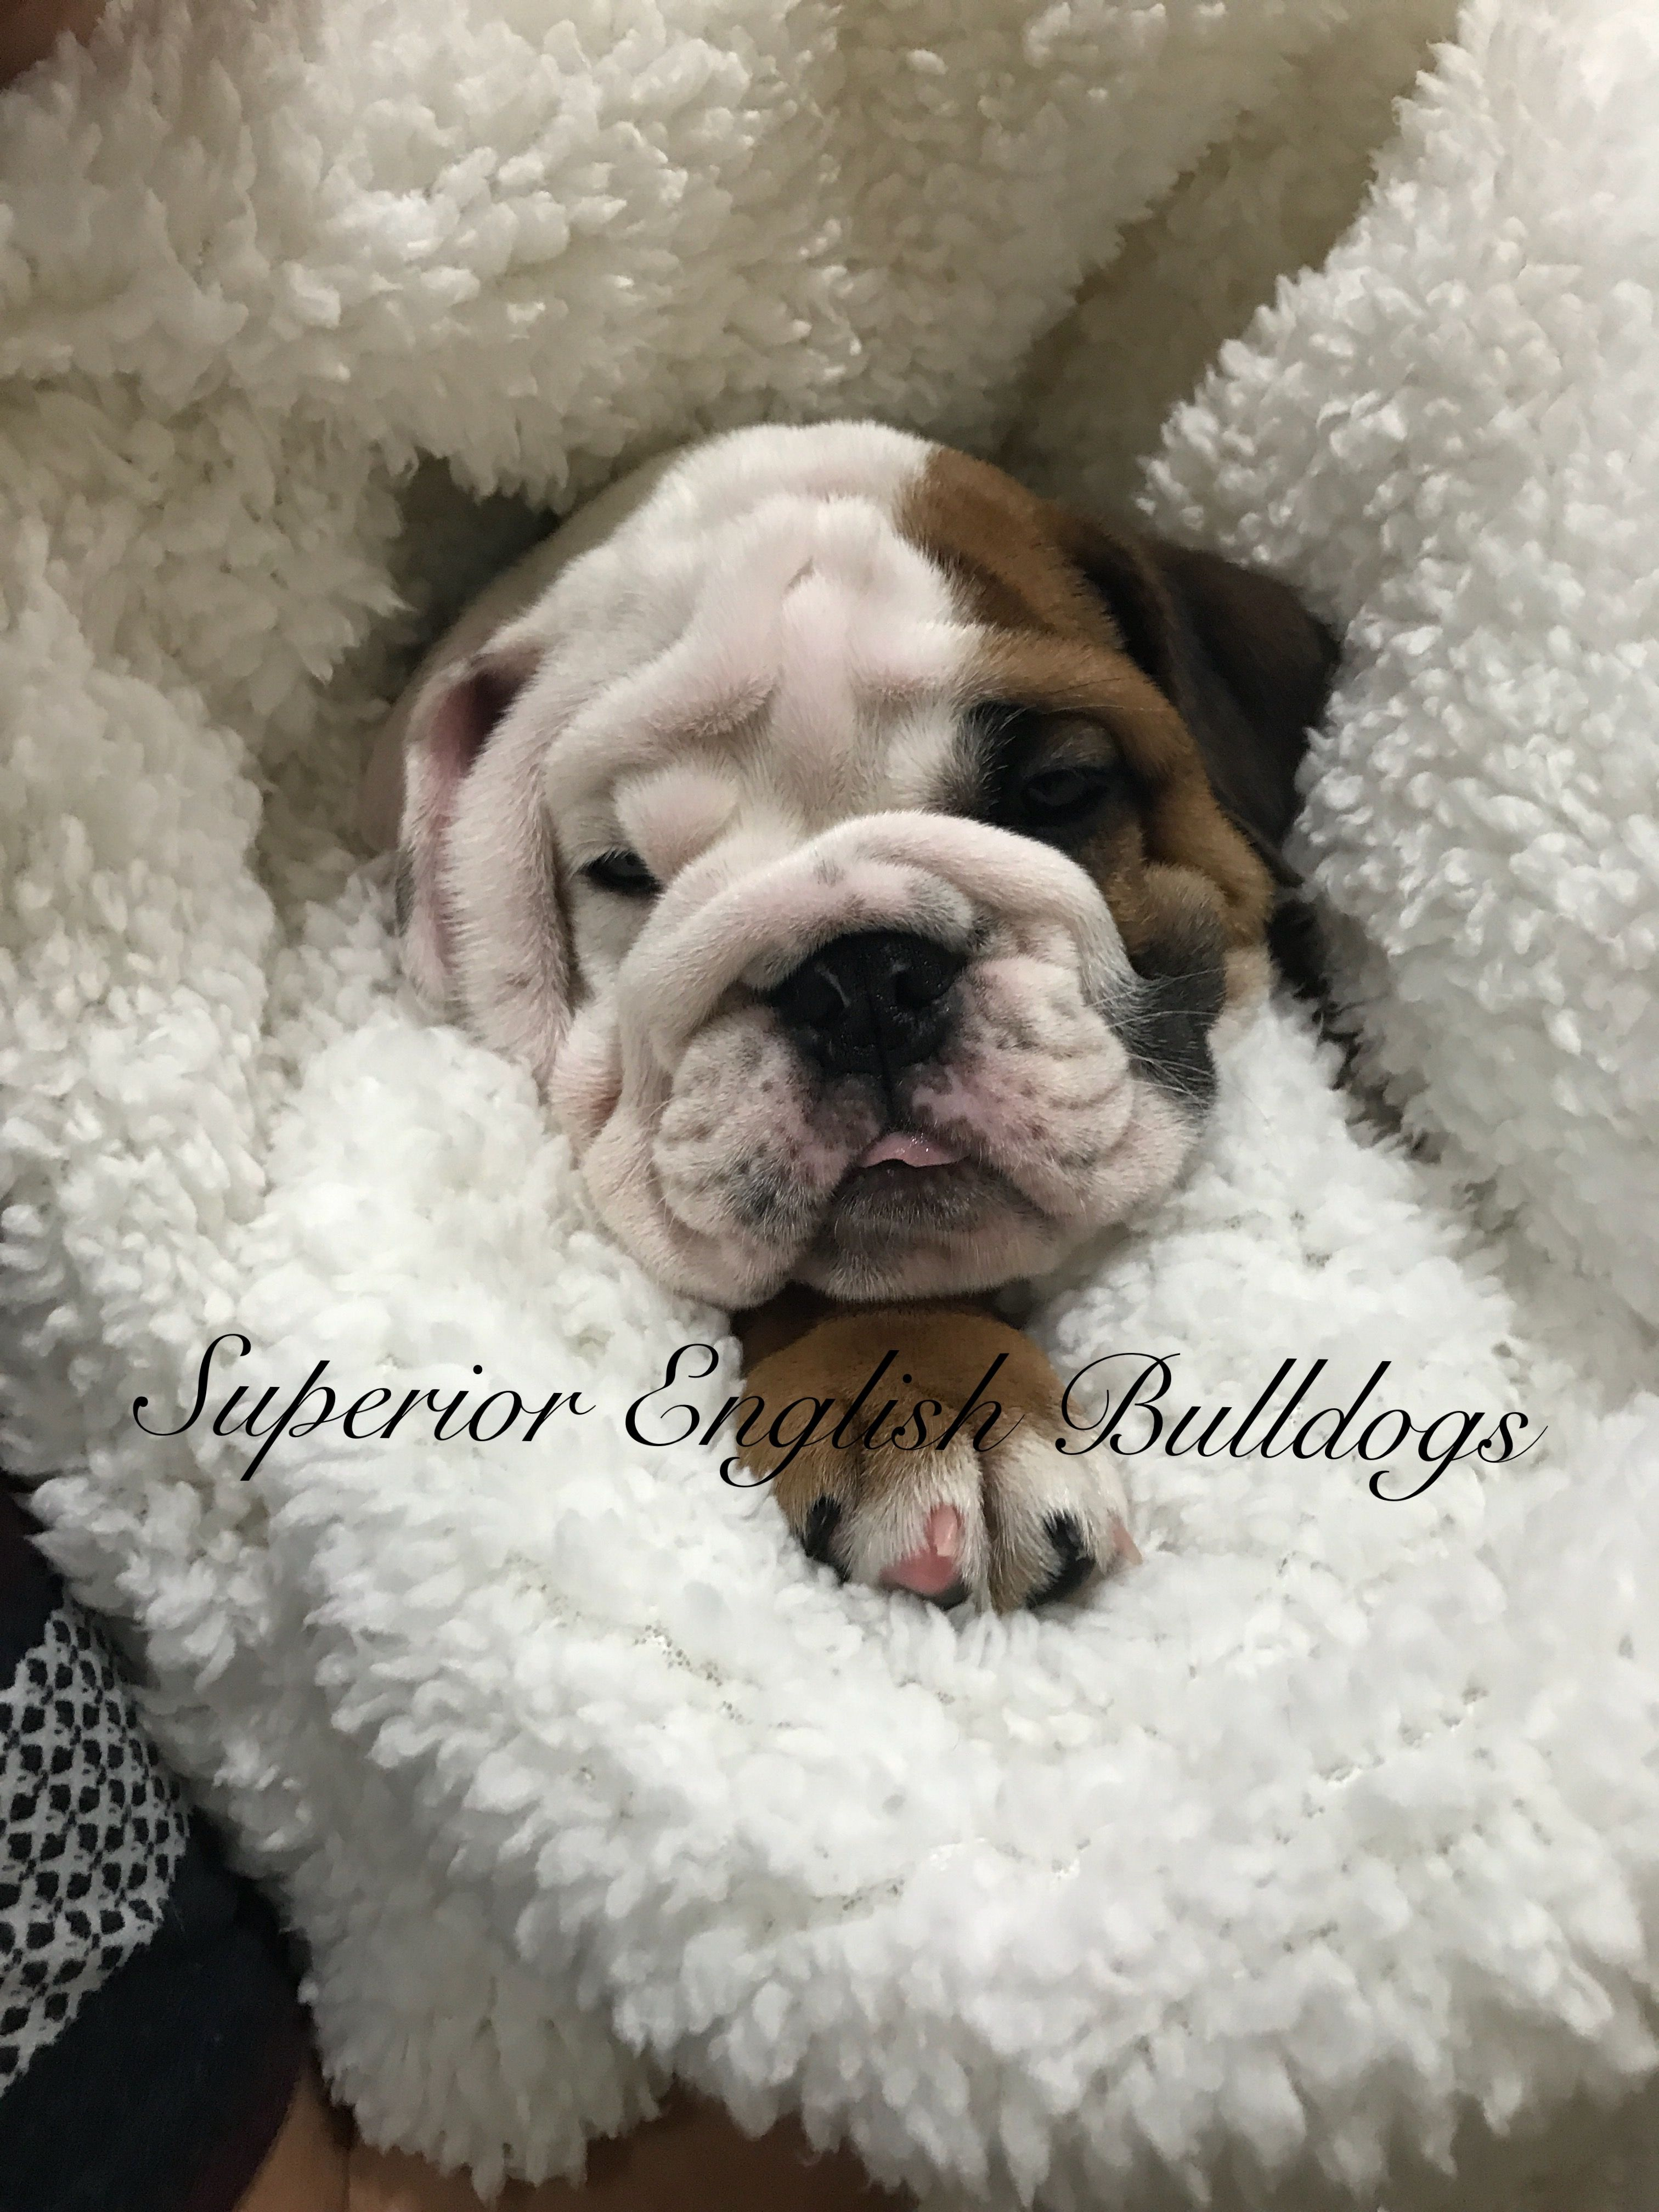 Pin By Superior English Bulldogs On English Bulldogs English